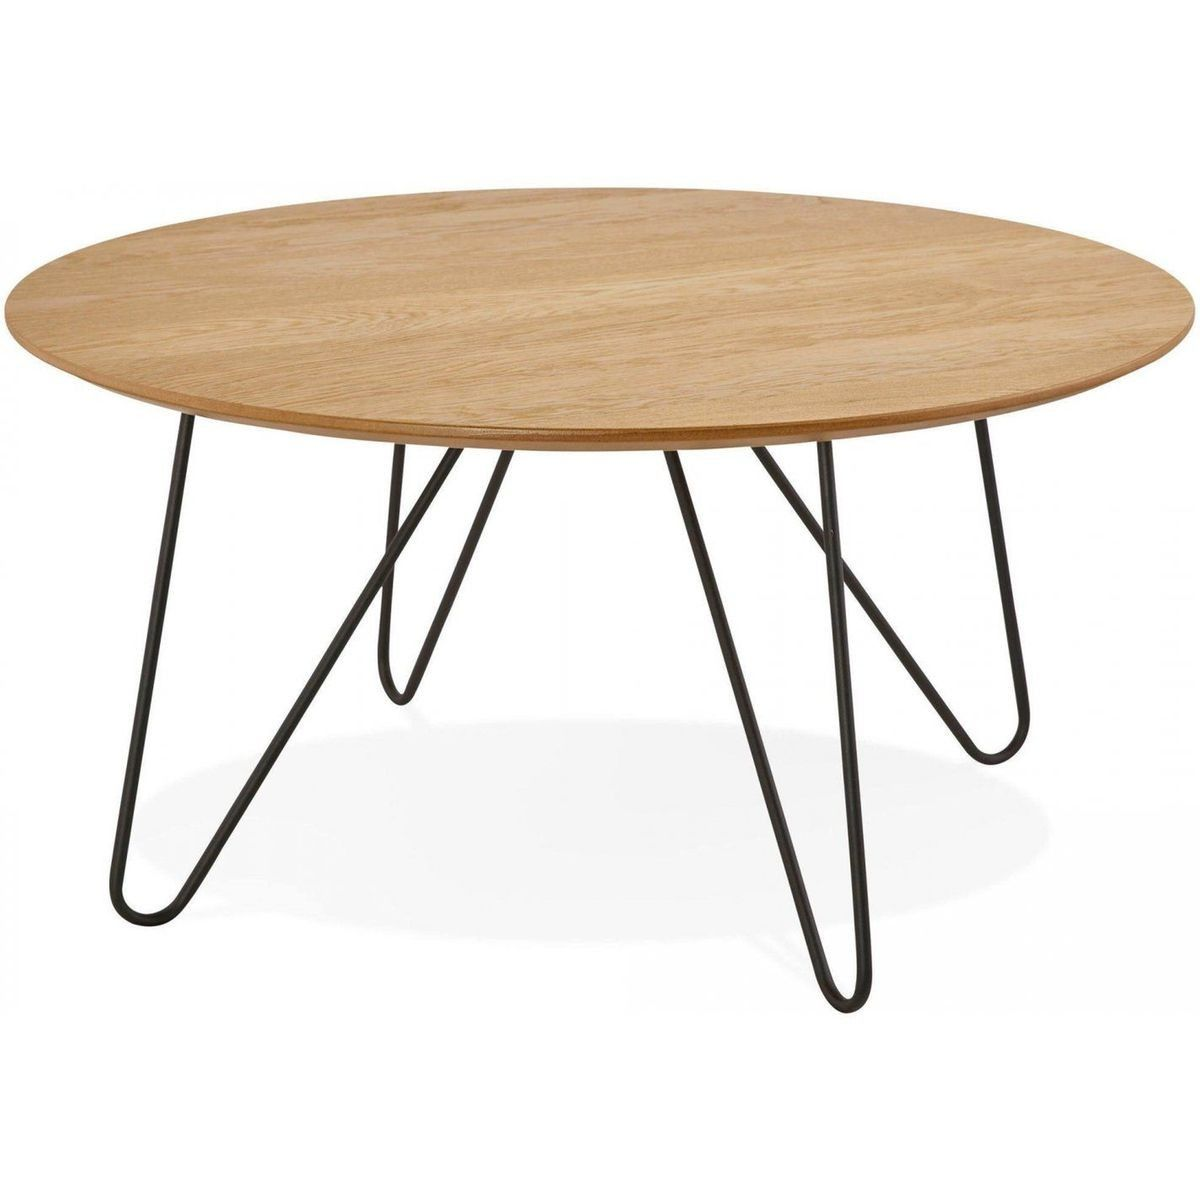 Table Basse Design Bois Bois Runda Taille Tu Table Basse Table Basse Design Table Basse Bois